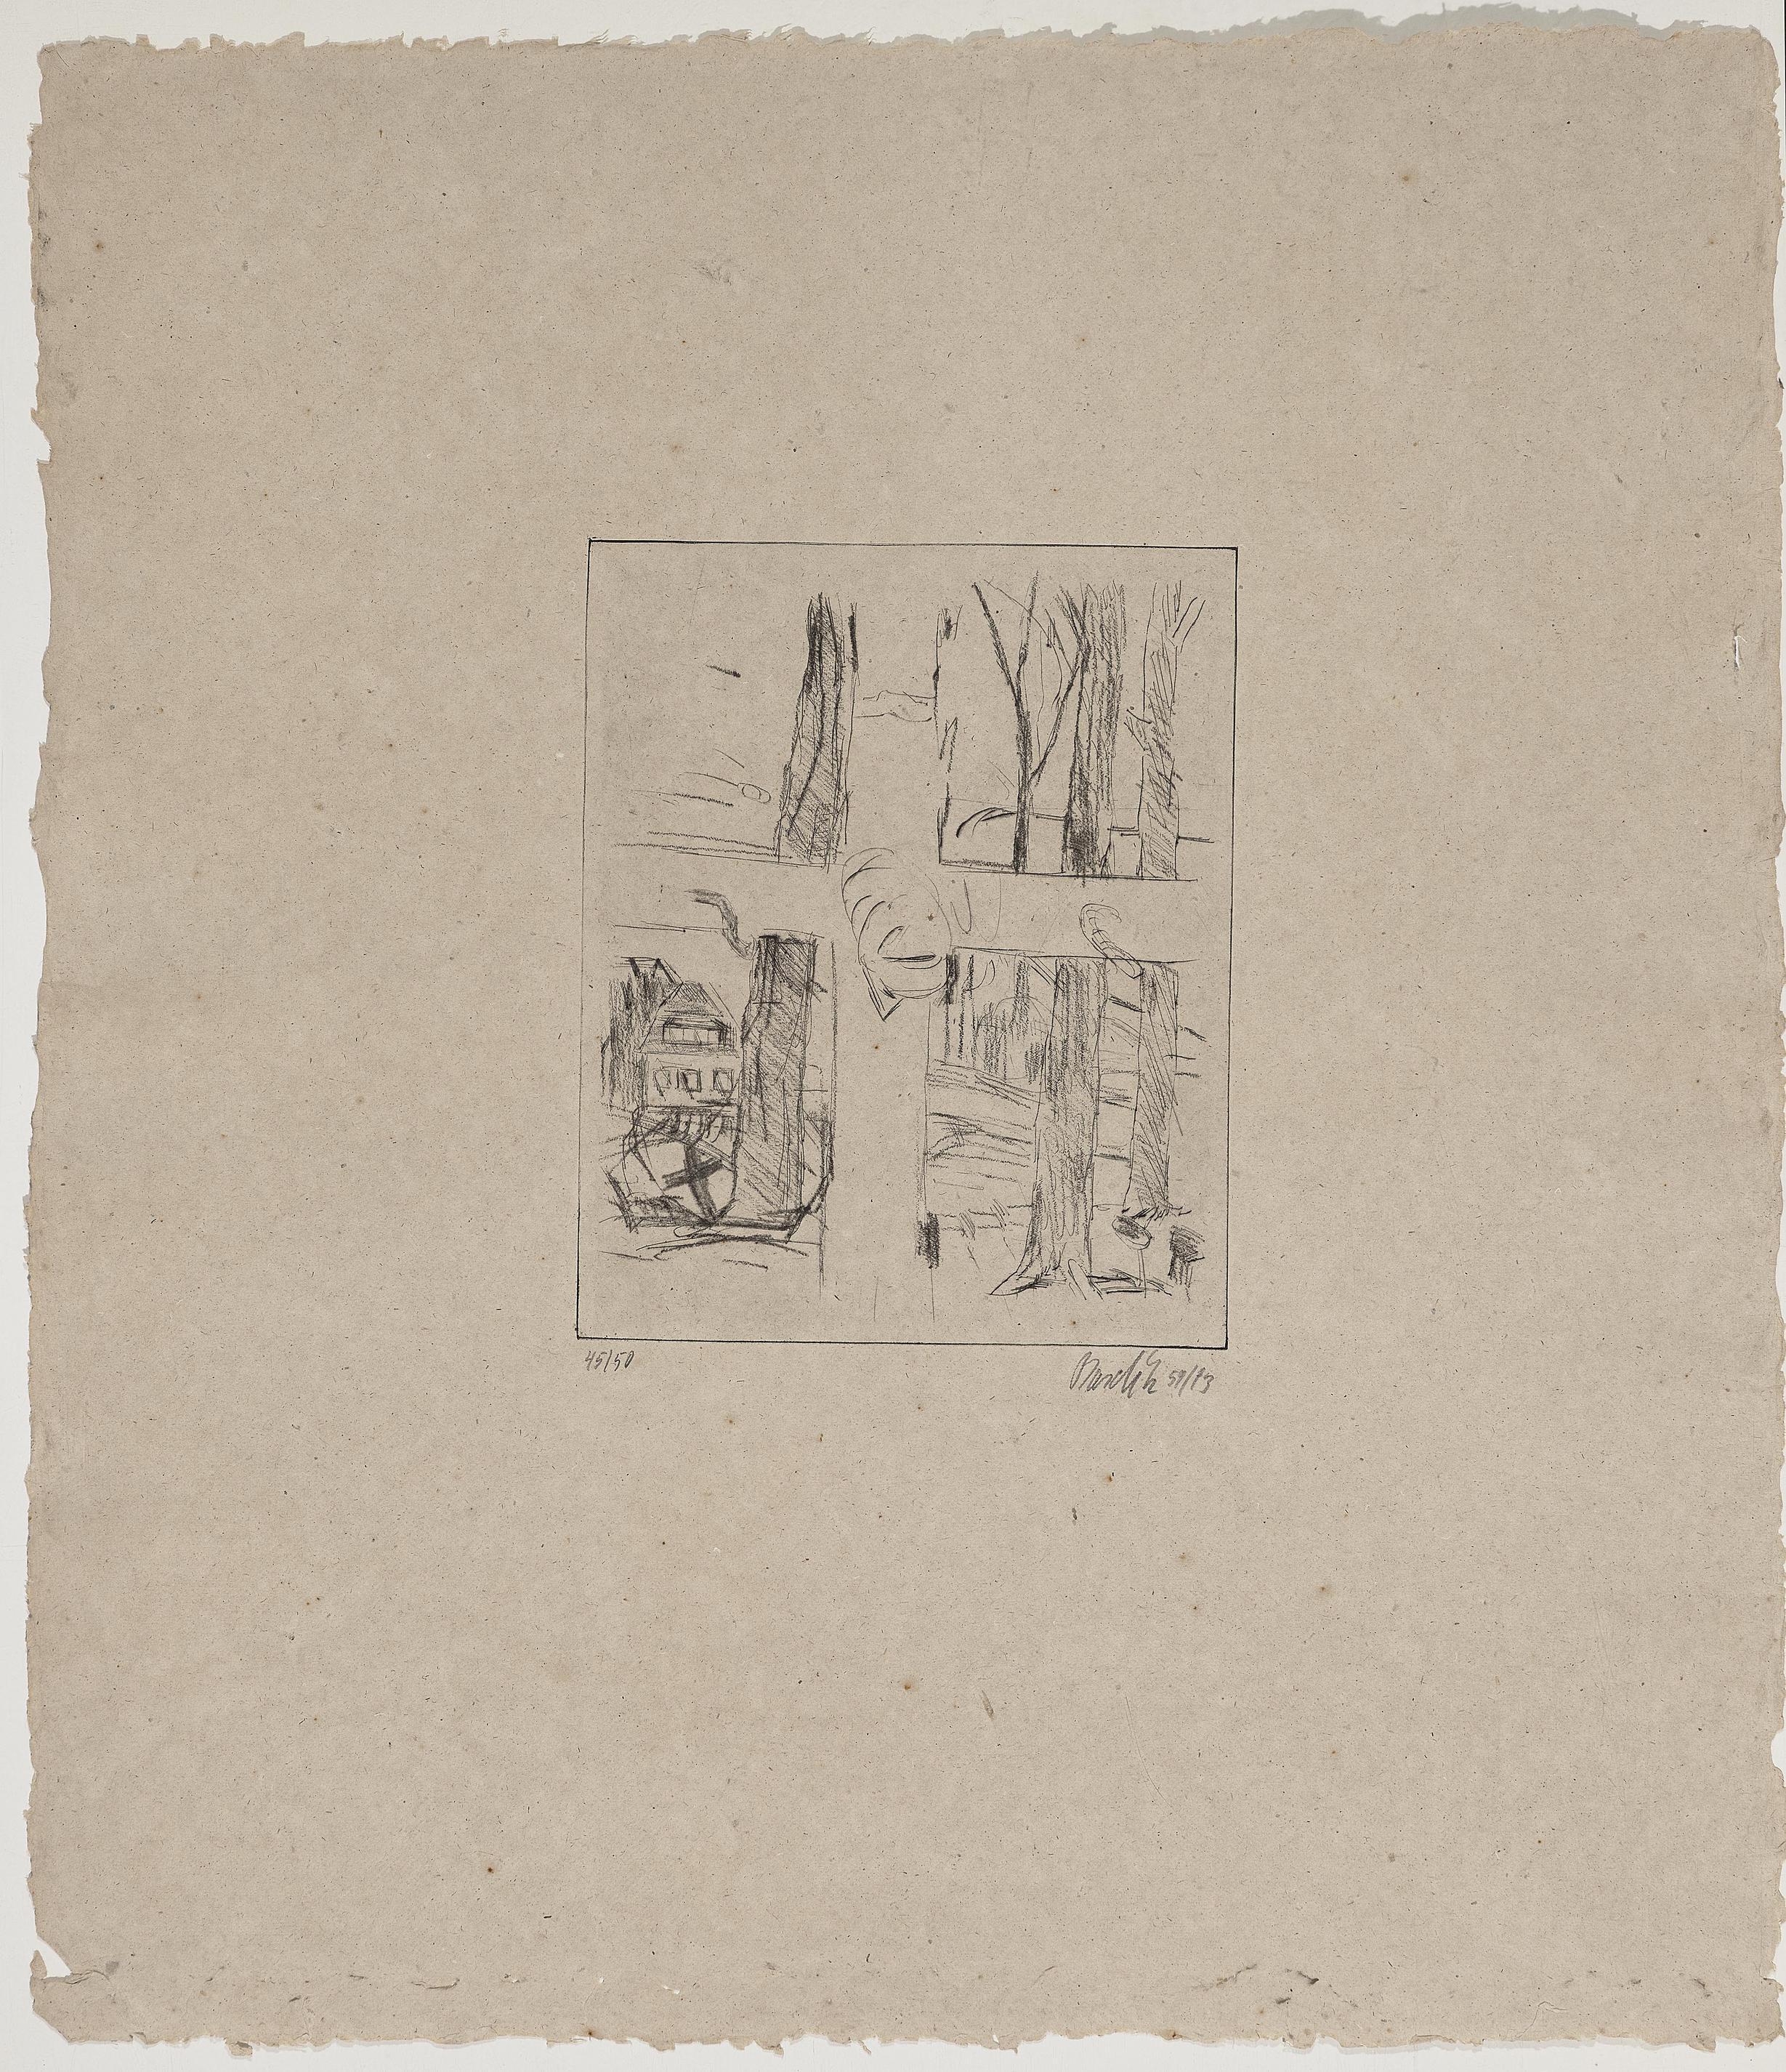 Georg Baselitz-Kreuz (Cross)-1973